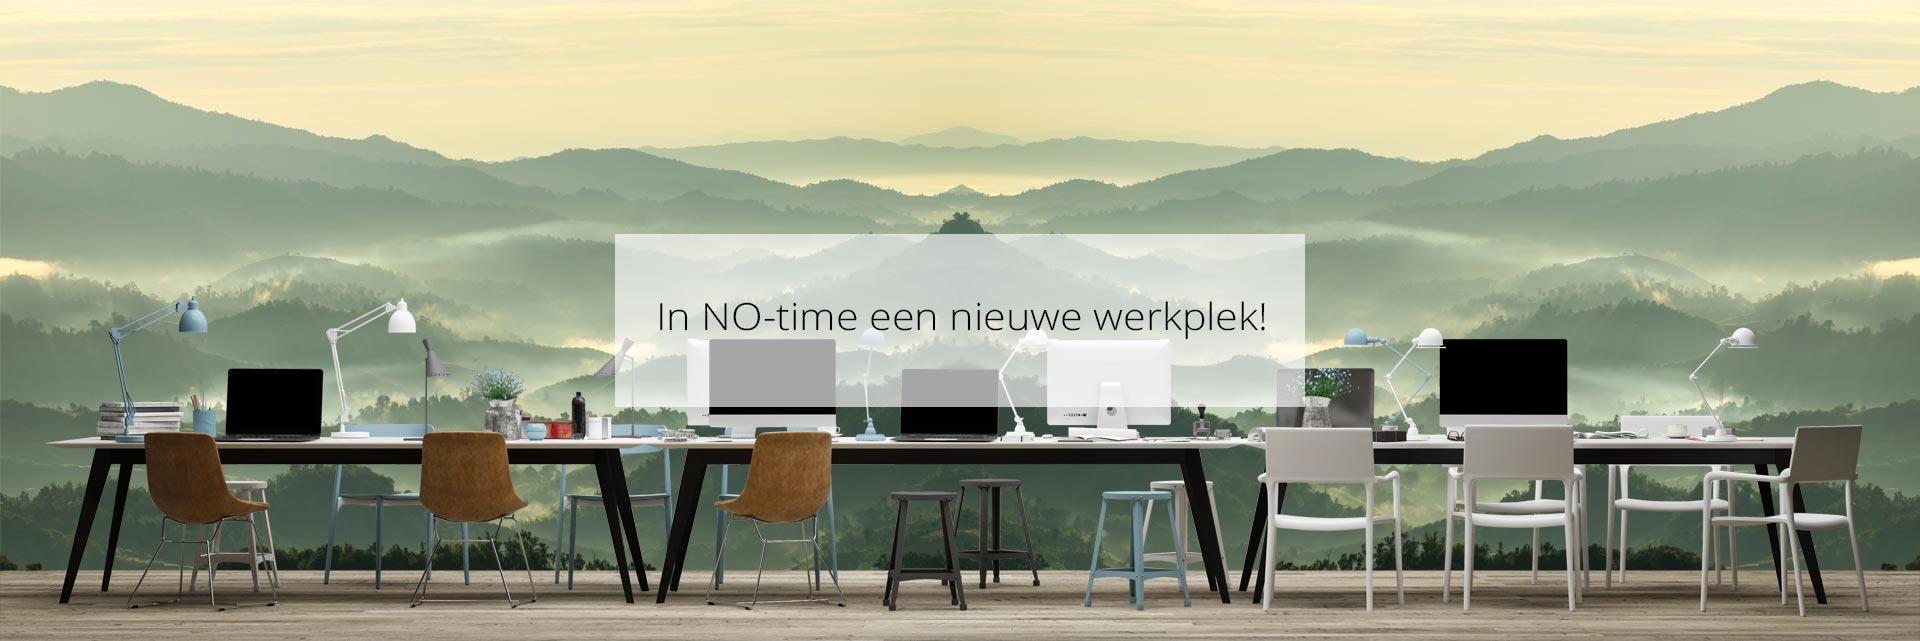 WANDenWOOndeco.nl B2B kantoorinrichting